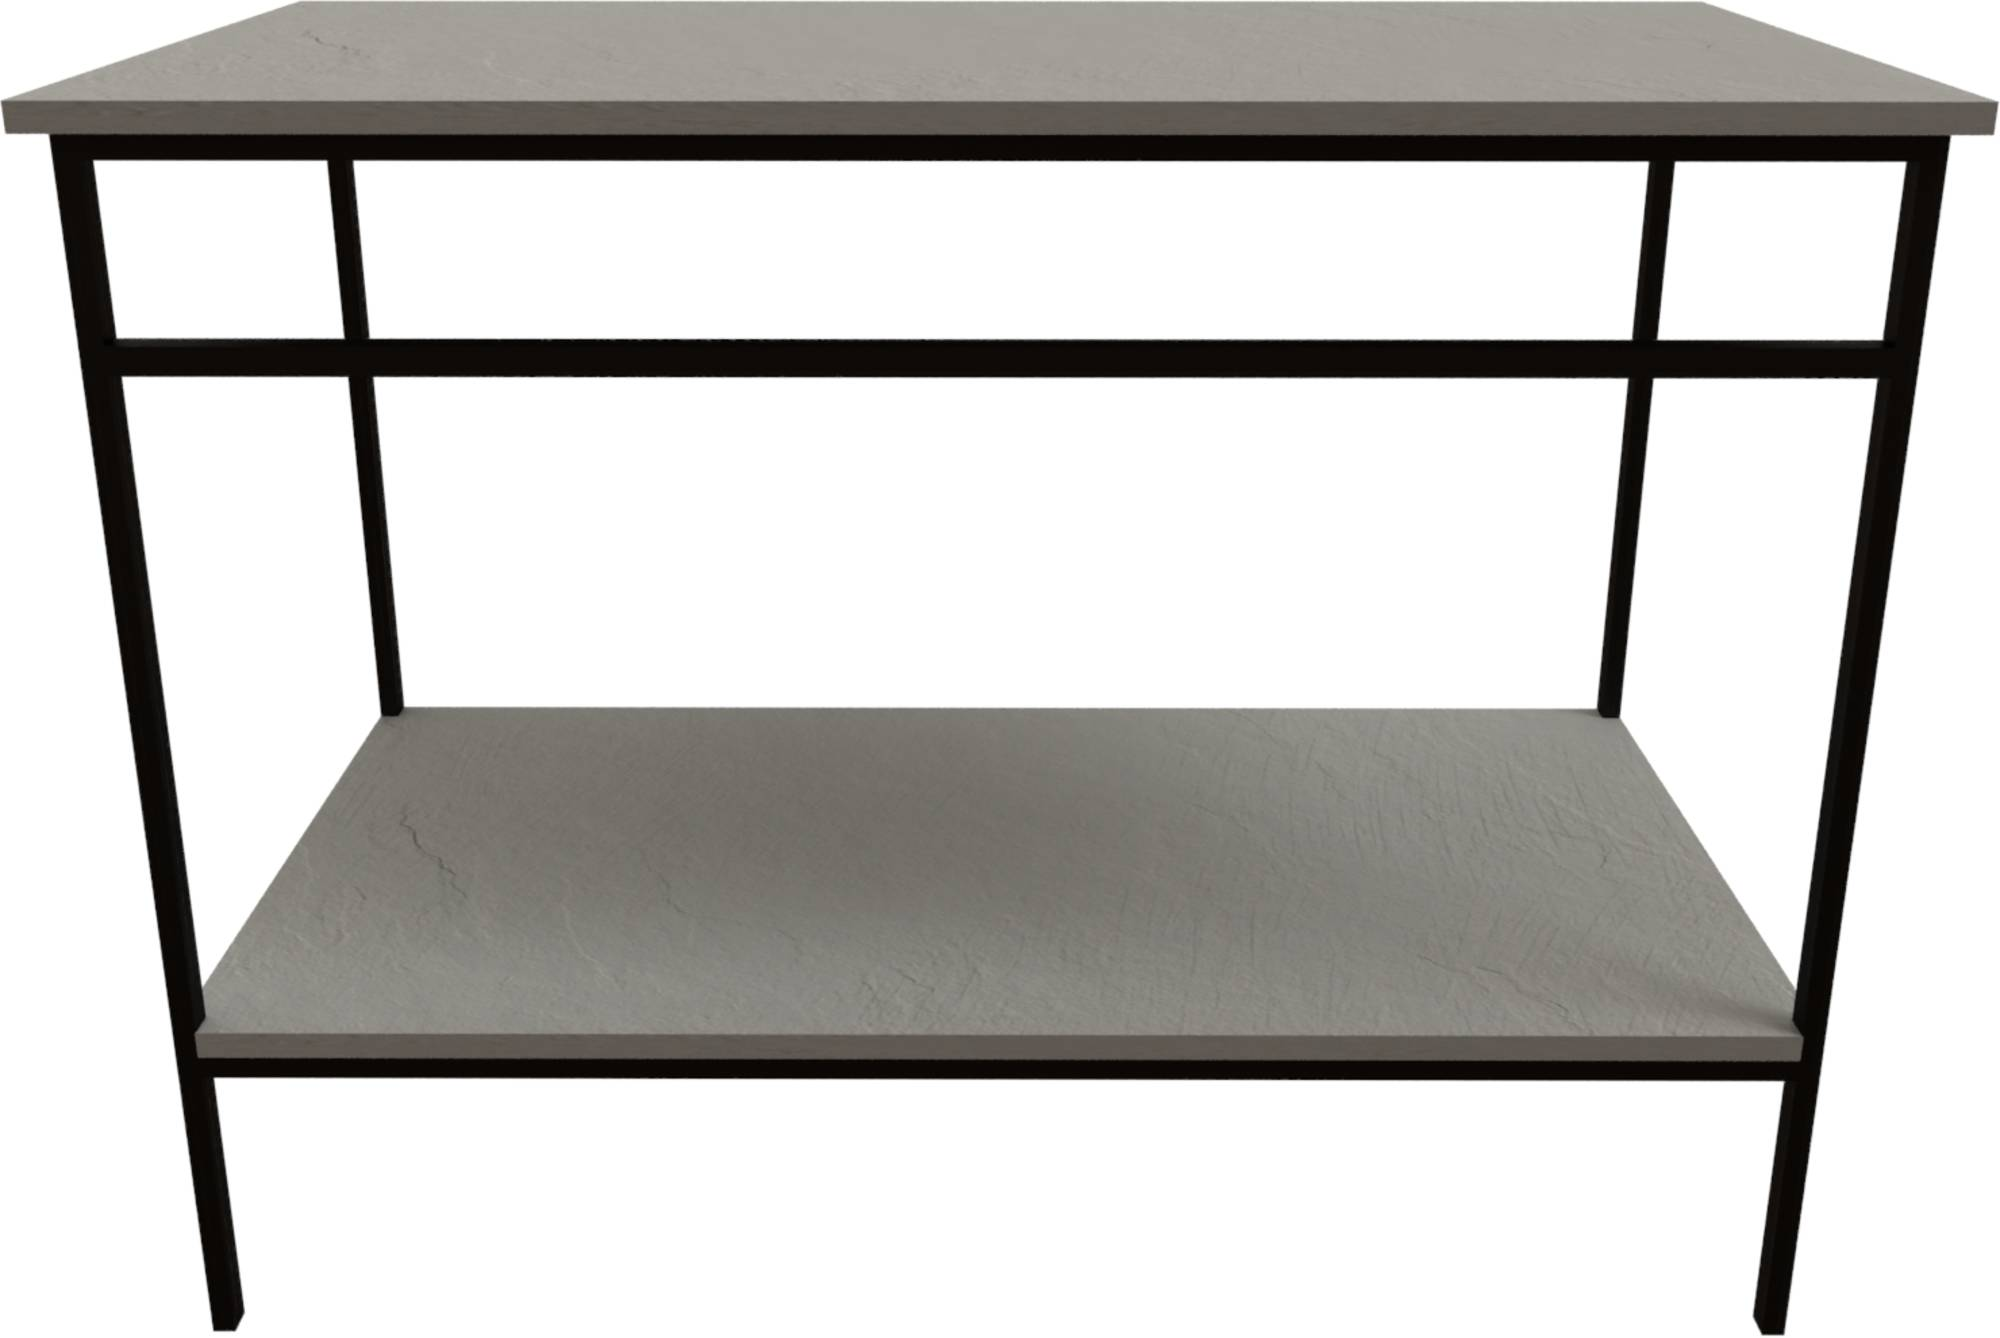 Ben Avira Set Staand Frame met Blad 100,3x46,5x85 cm Mat Zwart/Cement Grijs